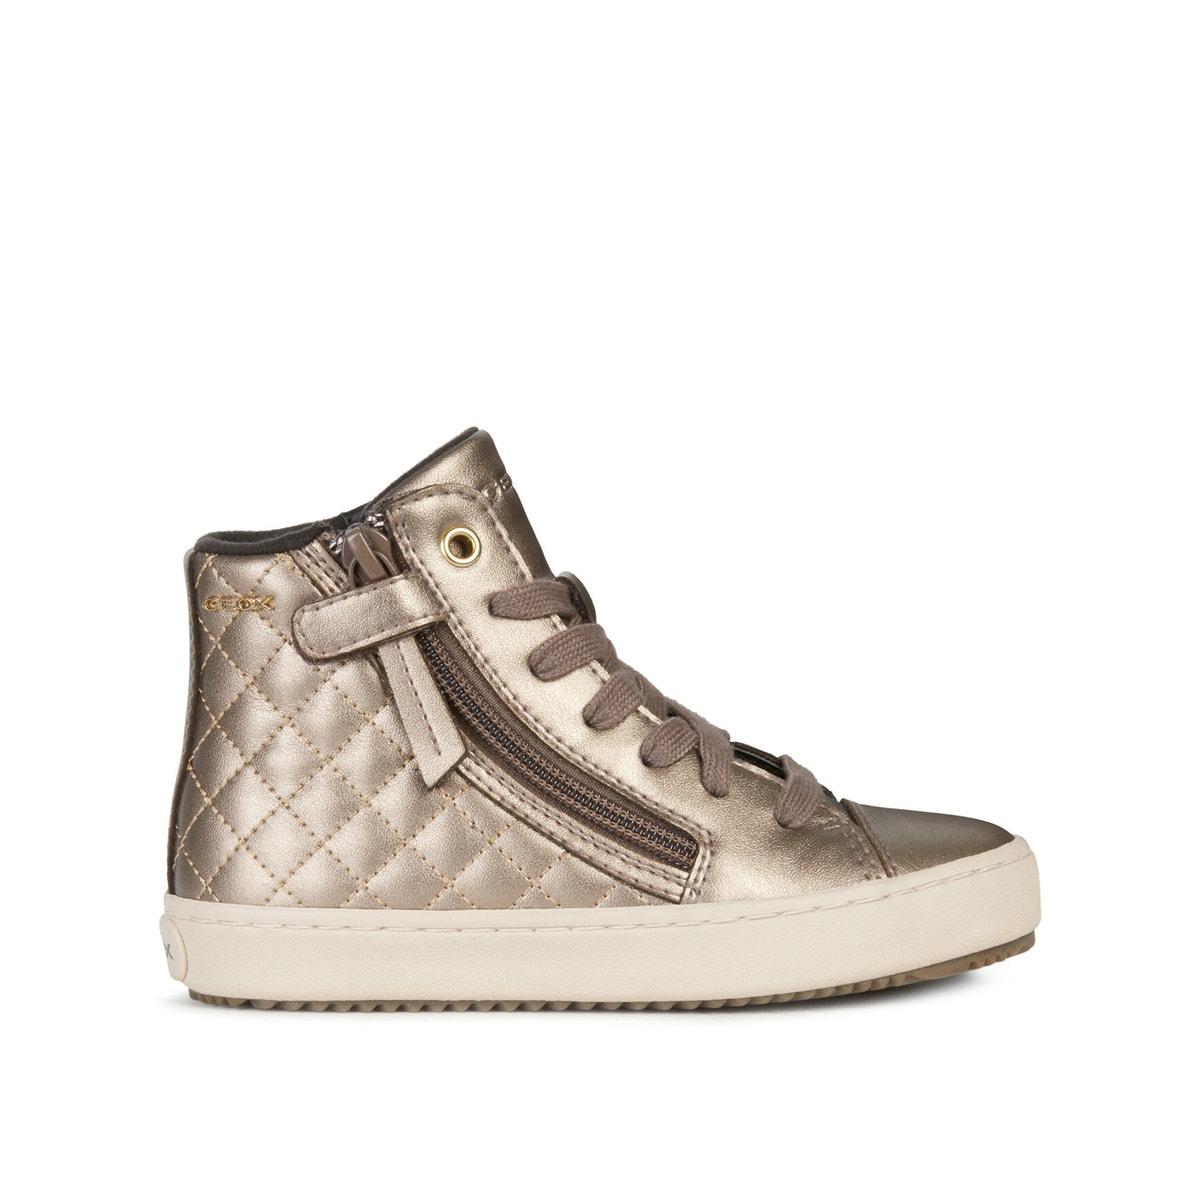 Geox - Geox Baskets Kalispera 350162641 - 10522